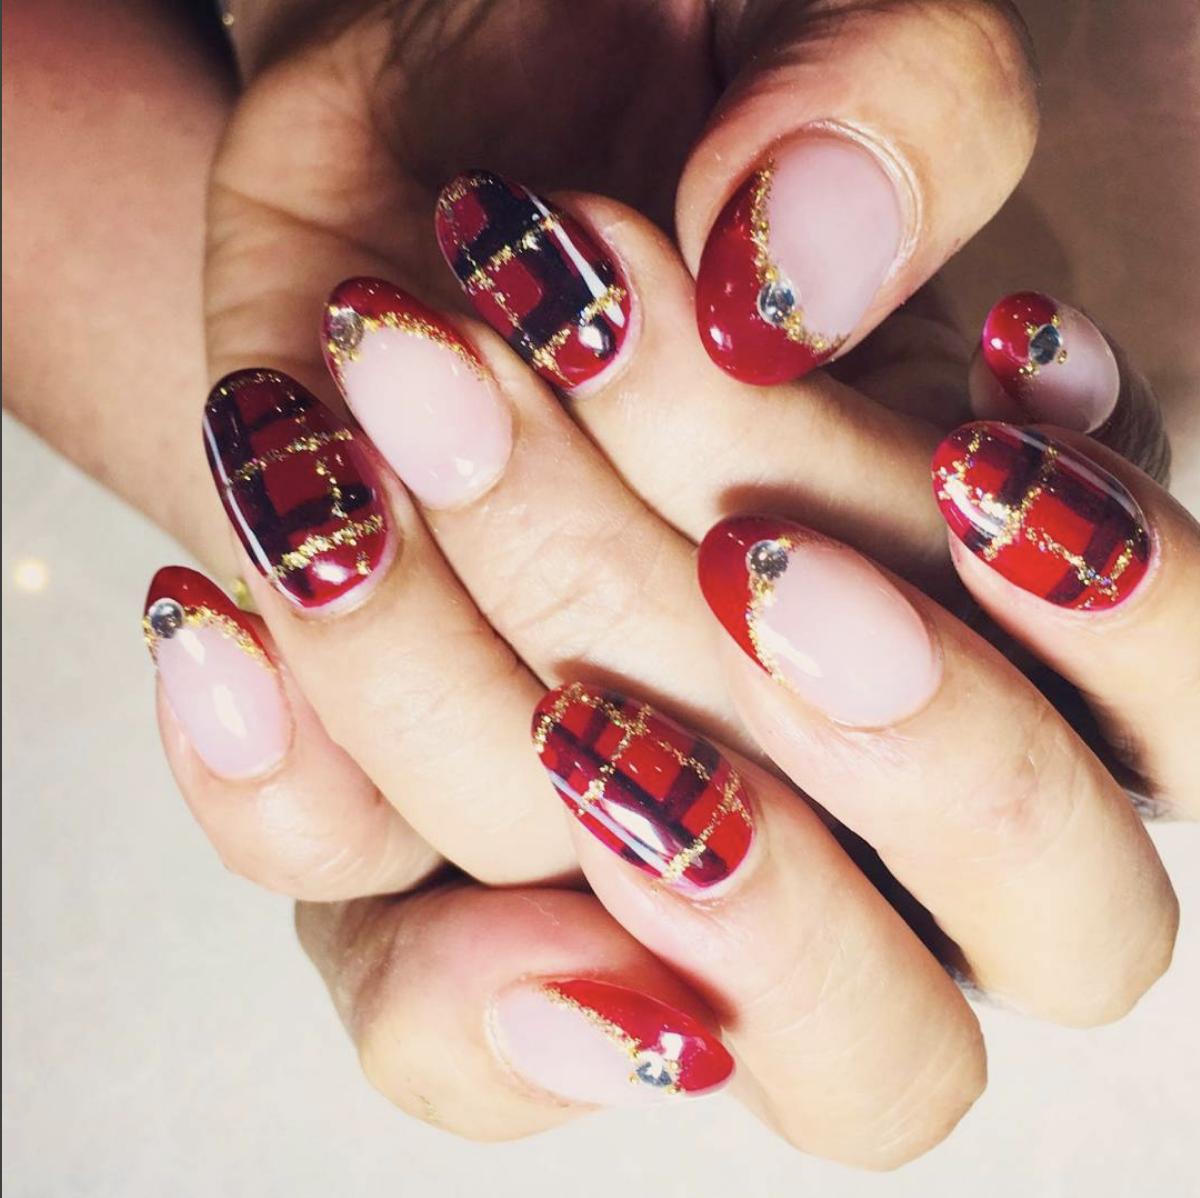 IBD Gel with Xmas nail art